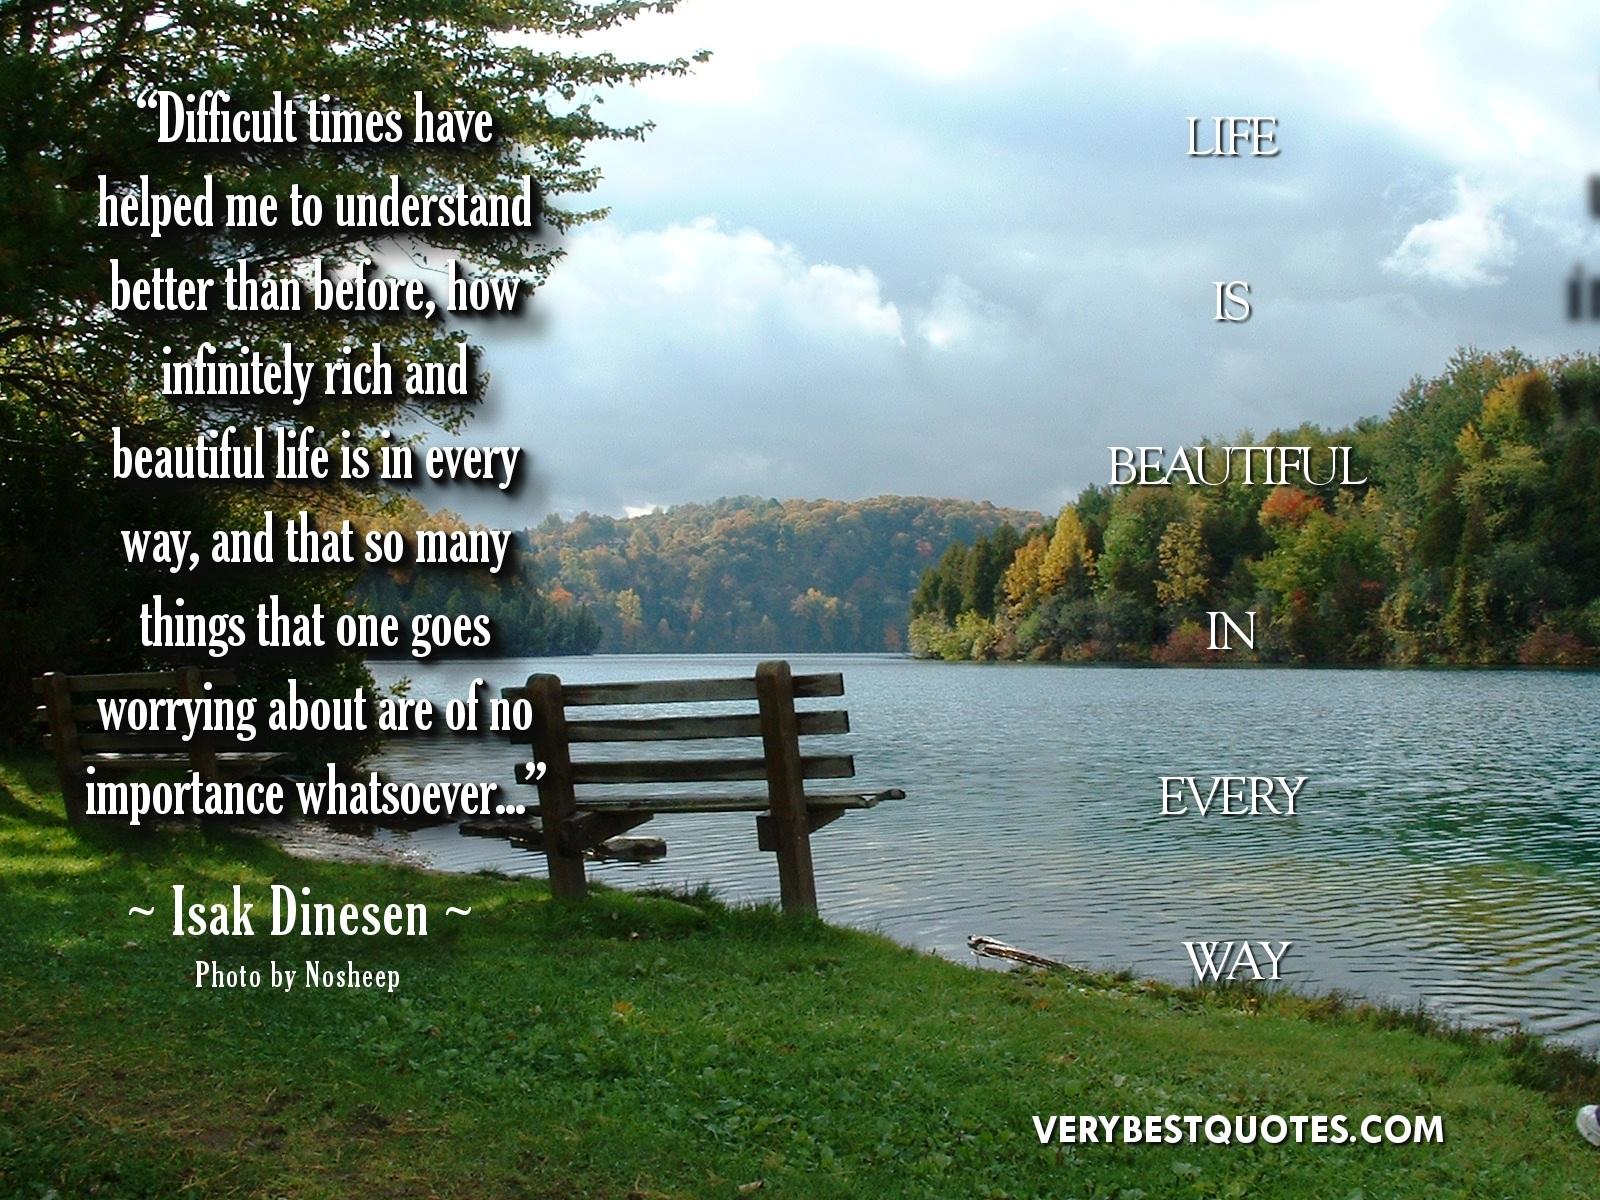 spiritual quotes for difficult times quotesgram